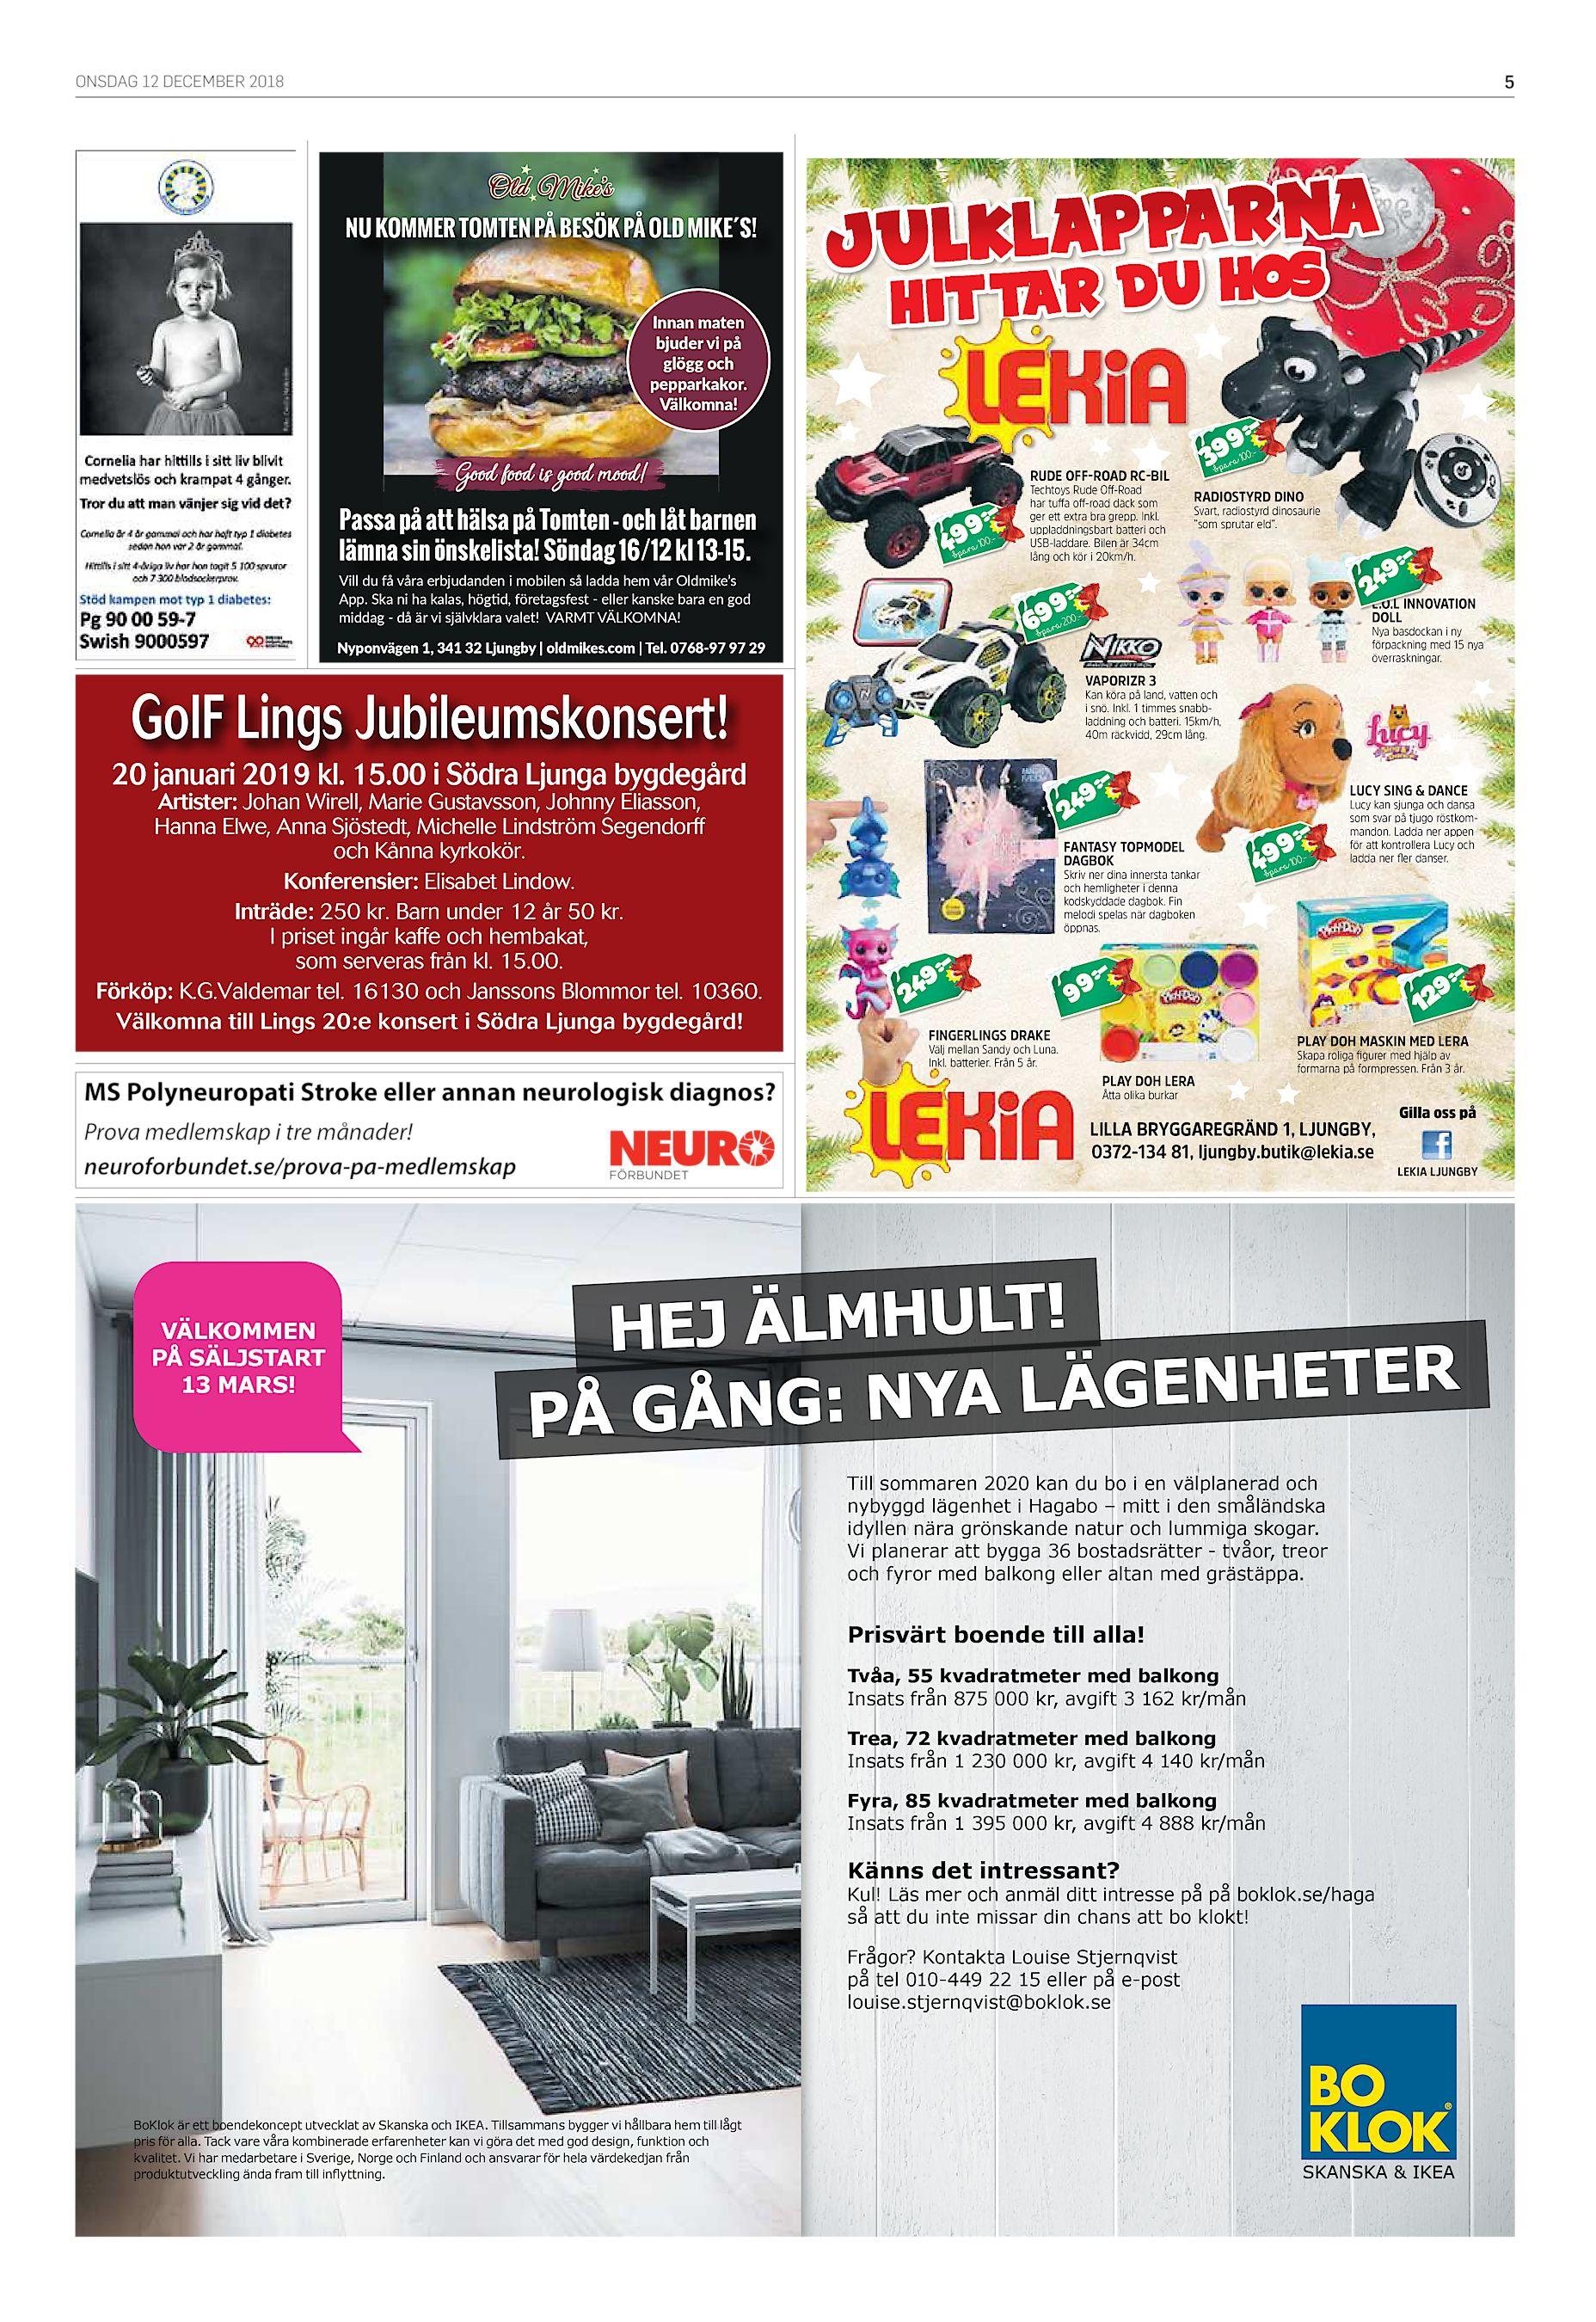 Hultskra Grd 1 Kronobergs Ln, Ljungby - unam.net